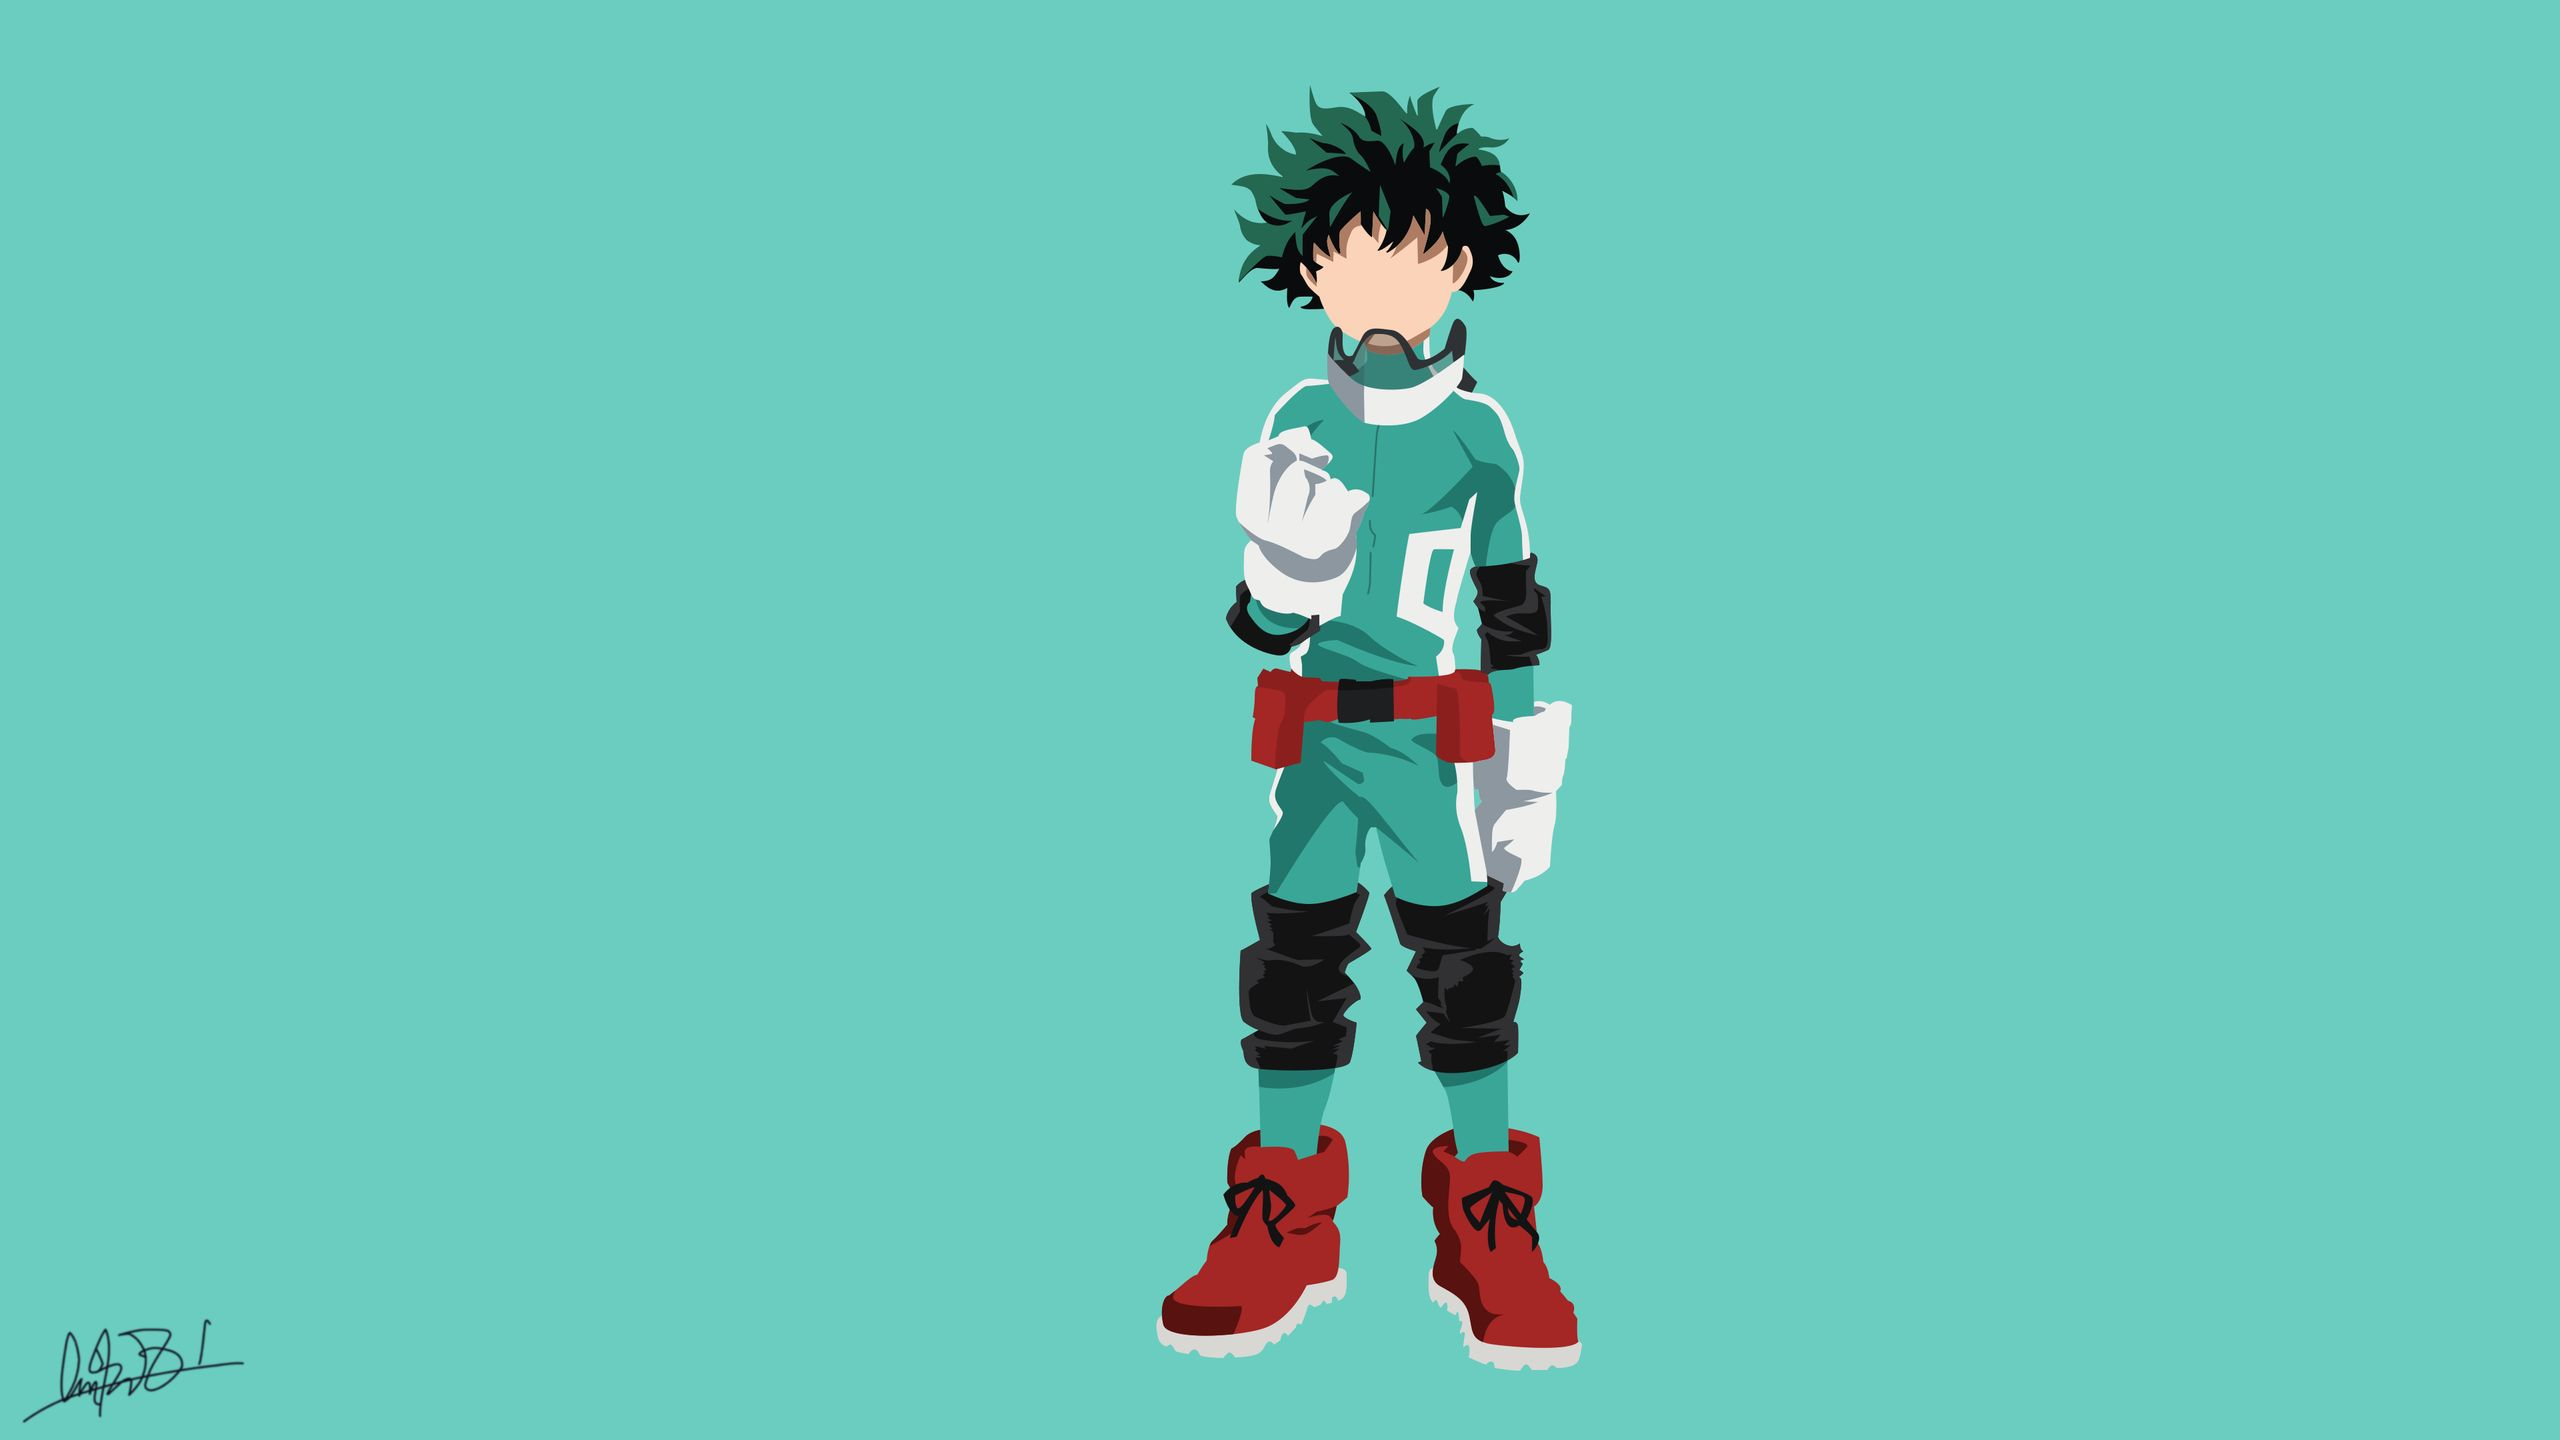 Boku No Hero Academia Hd Wallpapers New Tab Install Boku No Hero Academia New Tab And Get Hd Wallpapers Of Deku Anime My Hero Academia My Hero Academia Manga